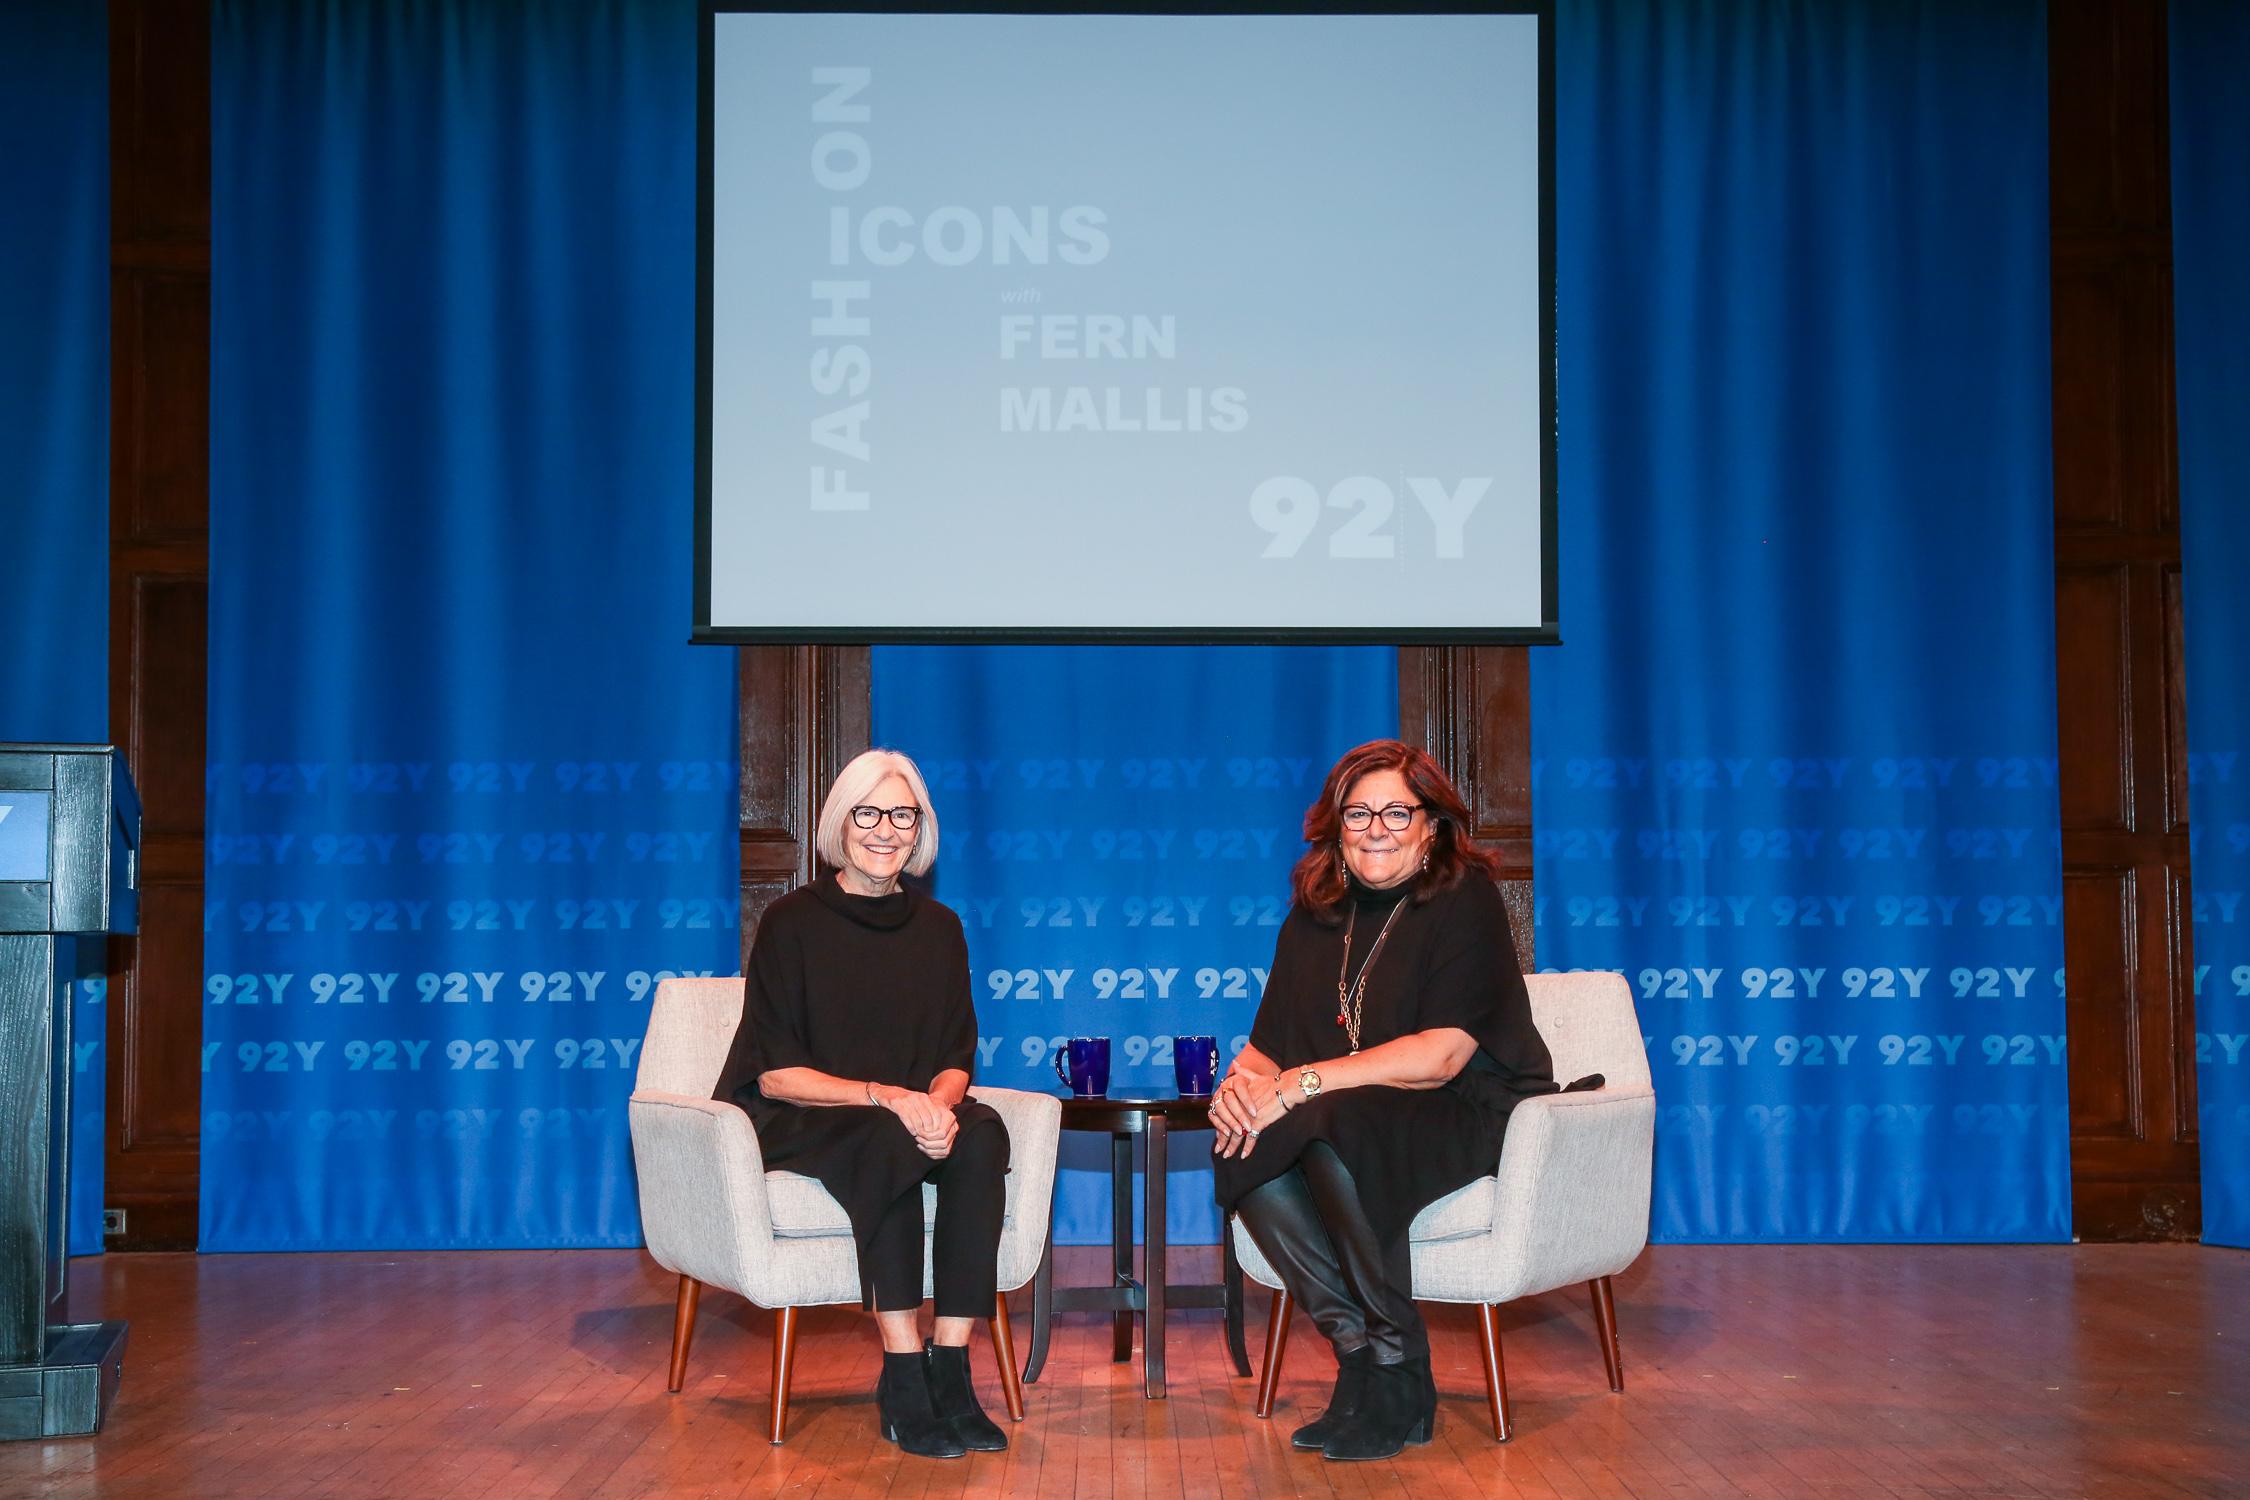 Eileen Fisher and Fern Mallis